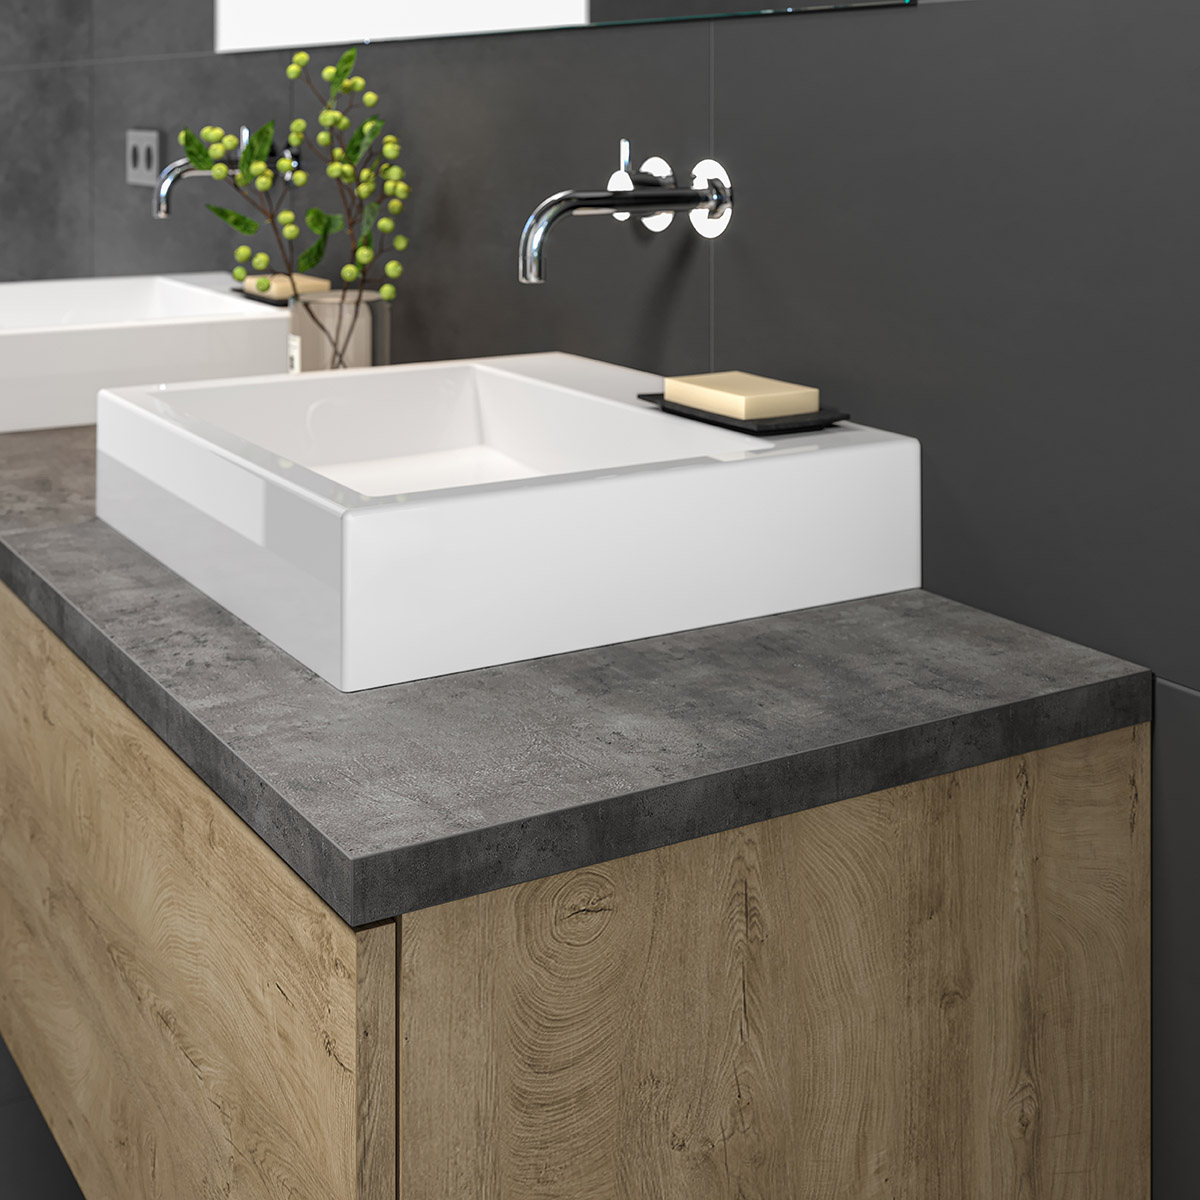 waschtischplatte 2 3 4 cm in betondekor nach ma. Black Bedroom Furniture Sets. Home Design Ideas